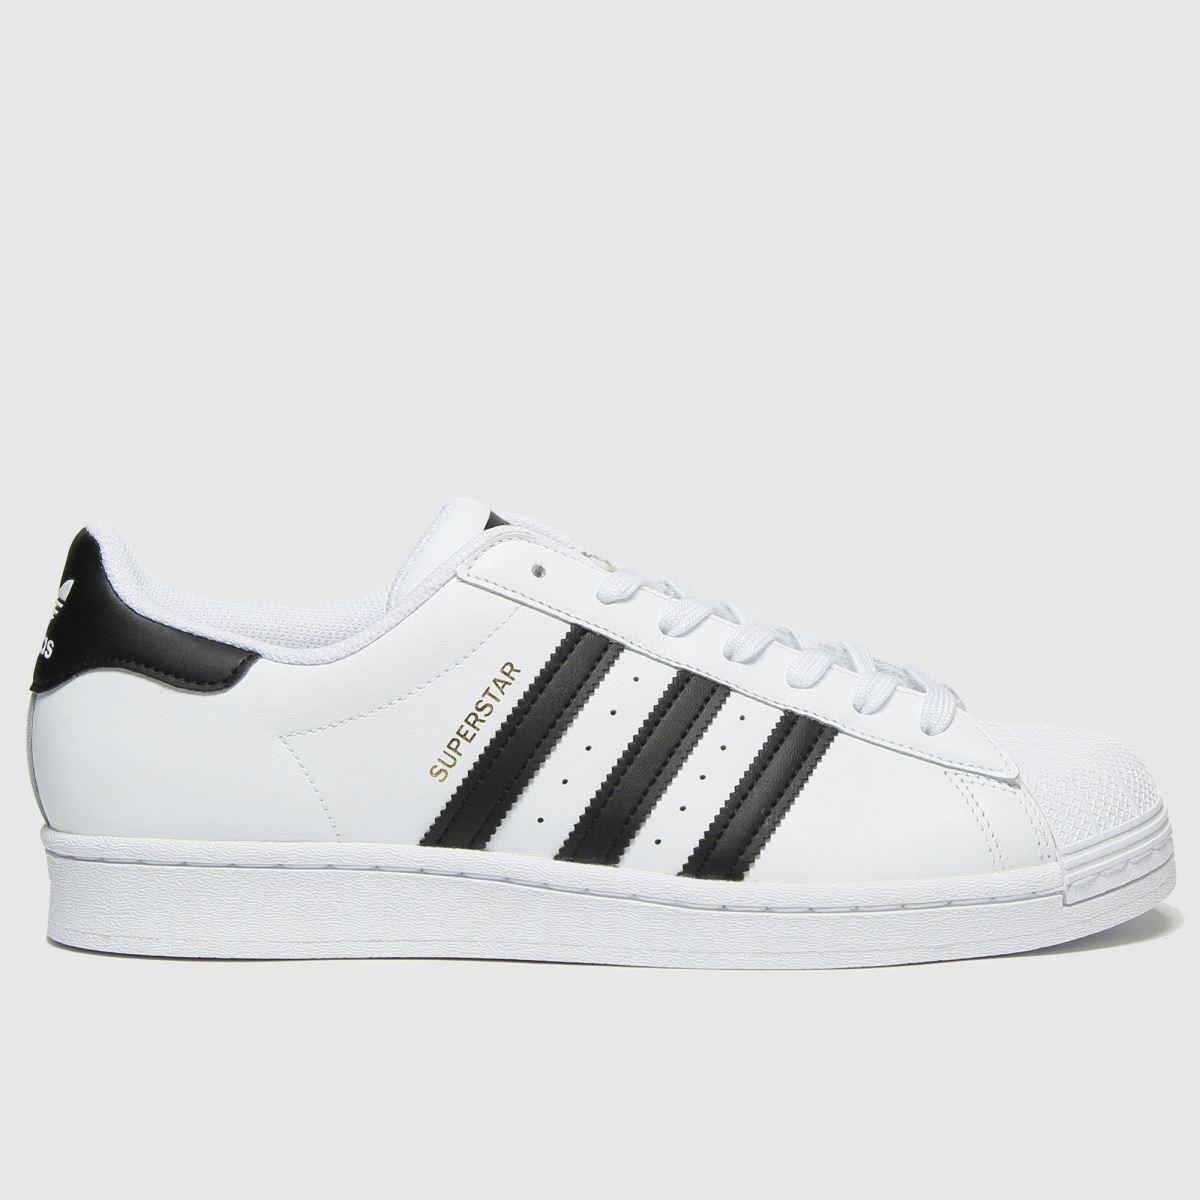 Adidas White & Black Superstar Trainers